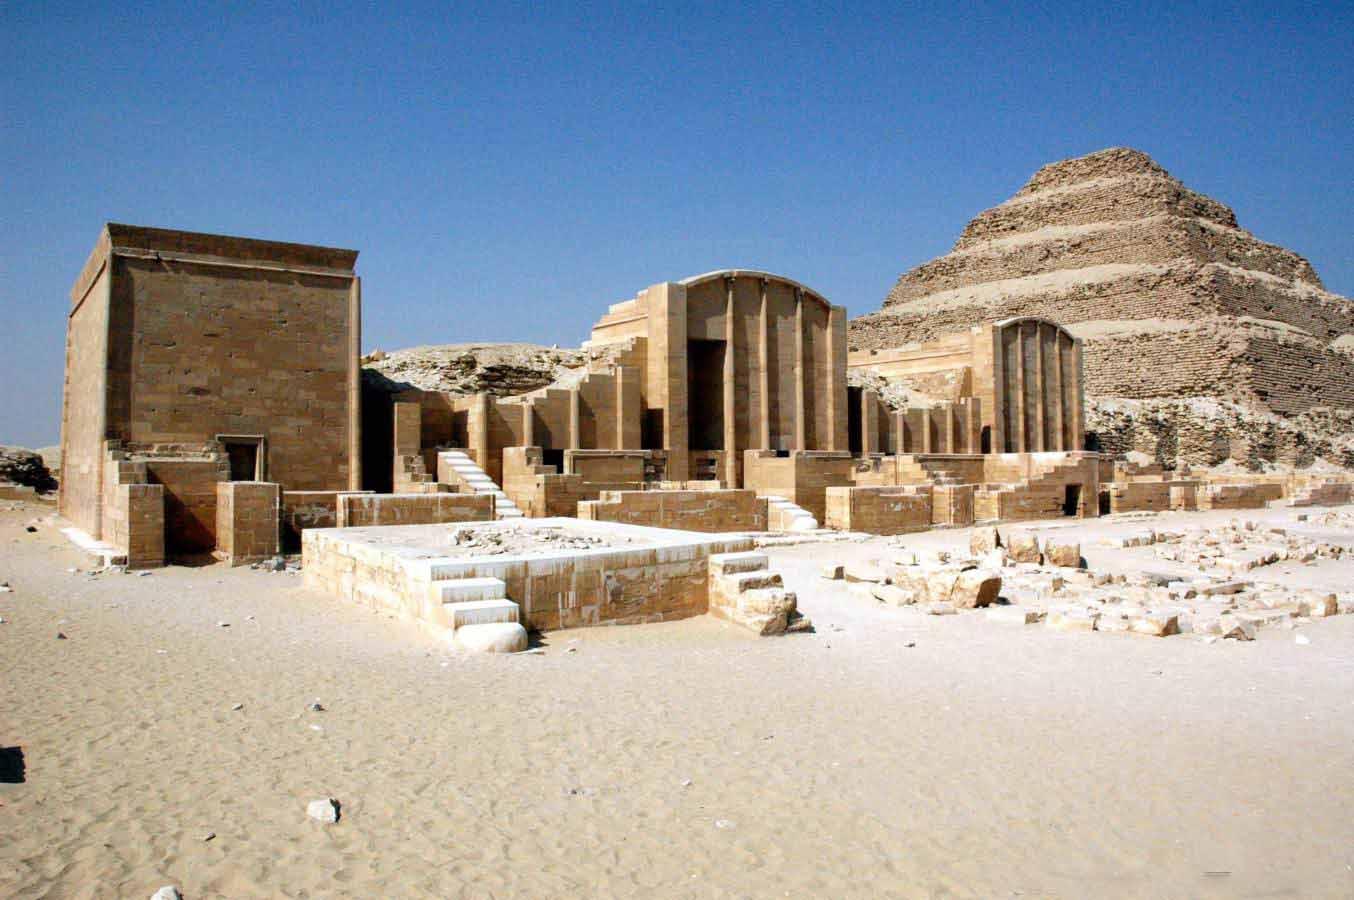 Sakkara Step Pyramid - Private Day Trip to Pyramids from Hurghada by Plane - Egypt Tours Portal